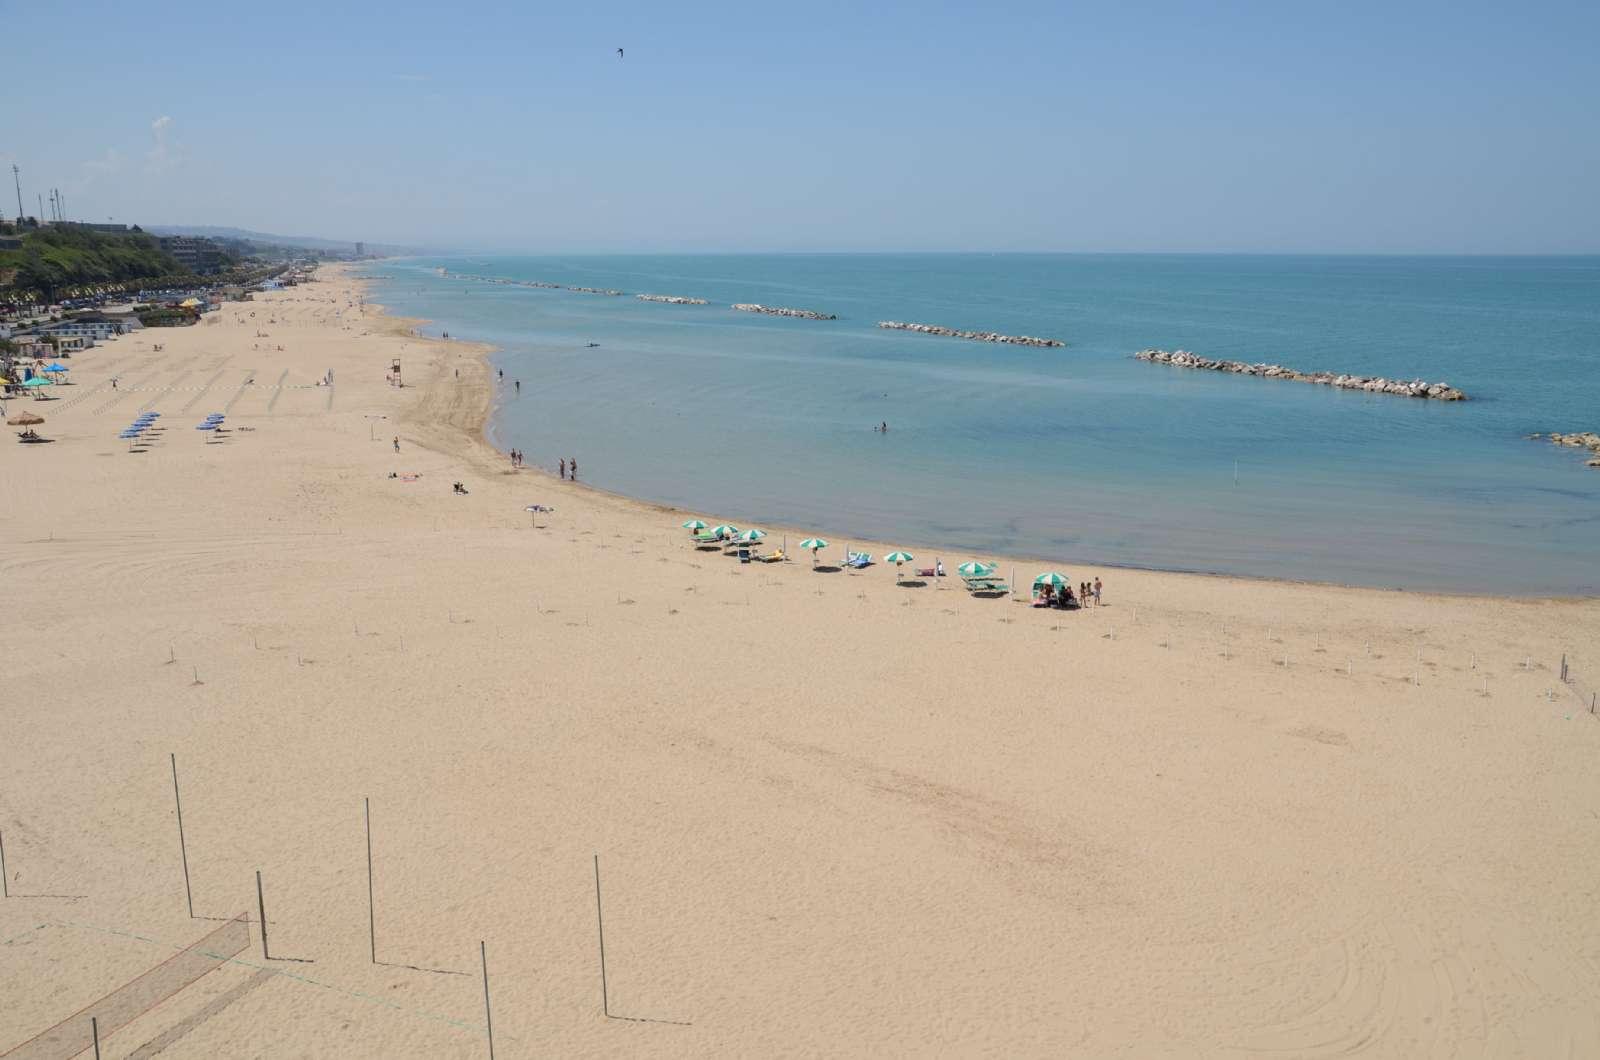 Plage de sable de Termoli